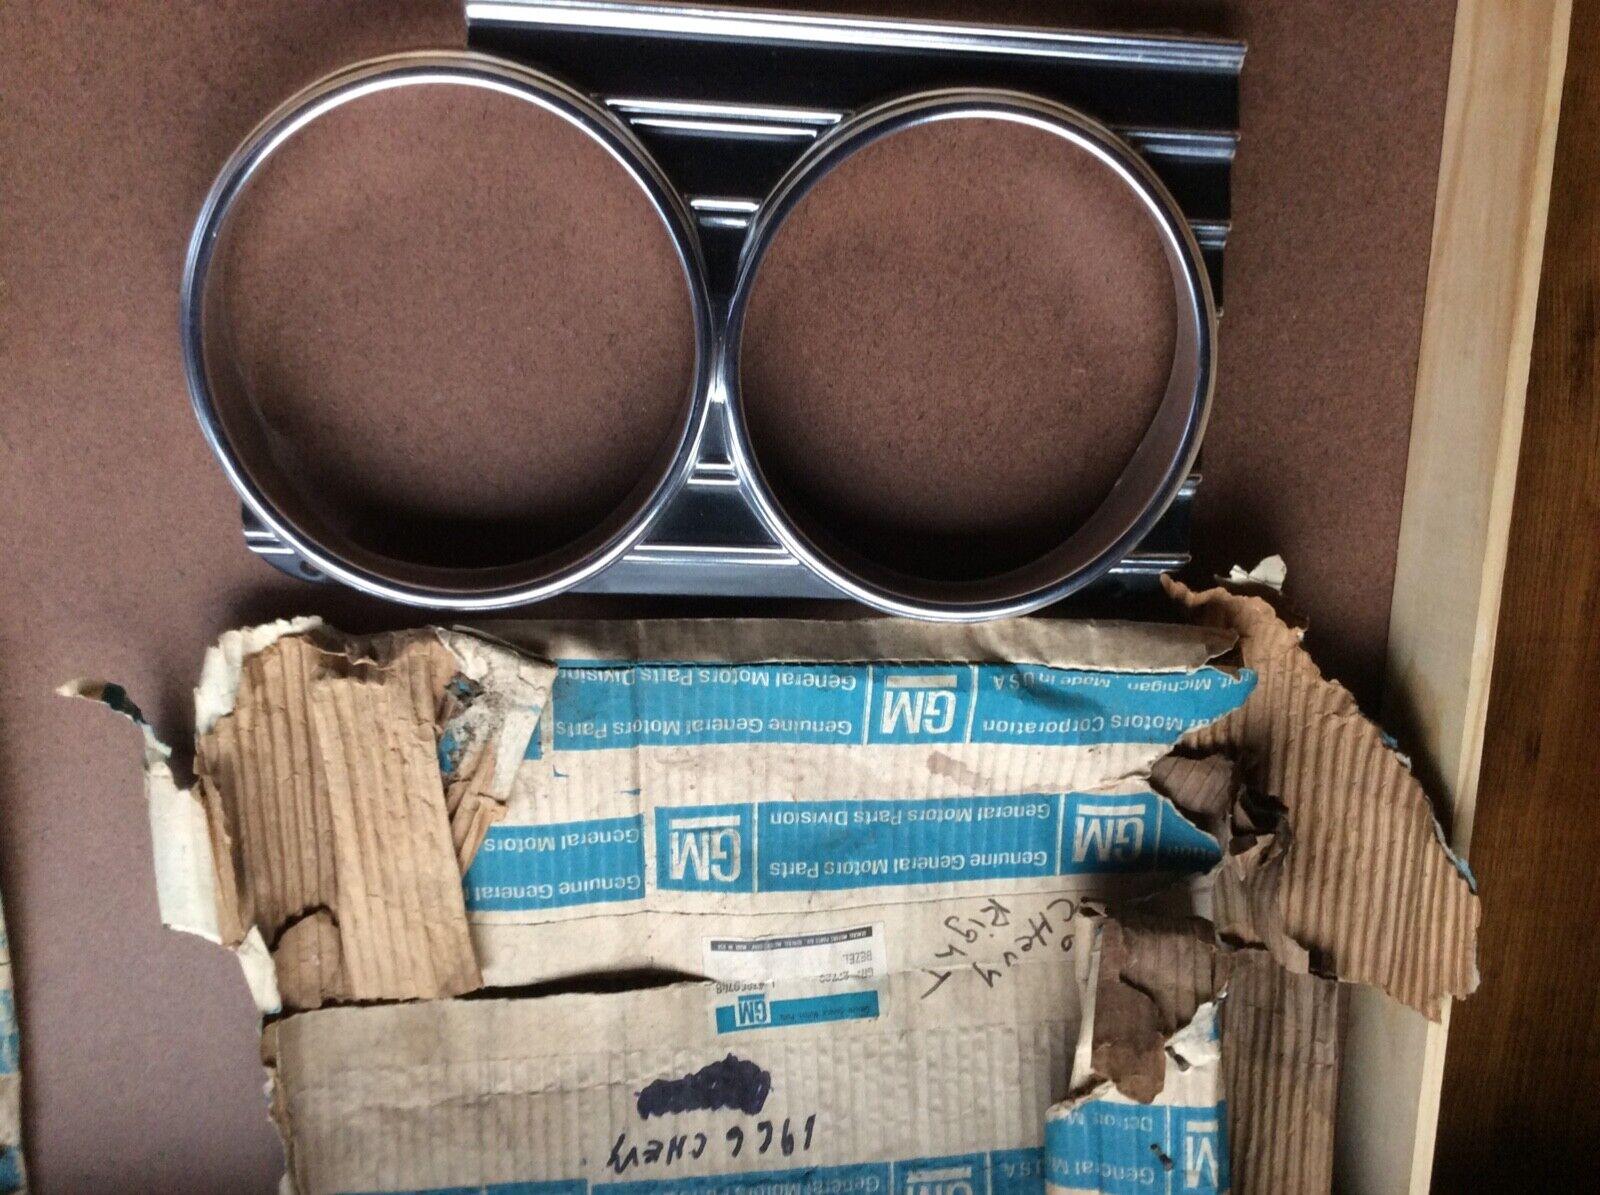 1966 chevy full size nos headlight bezels pr.